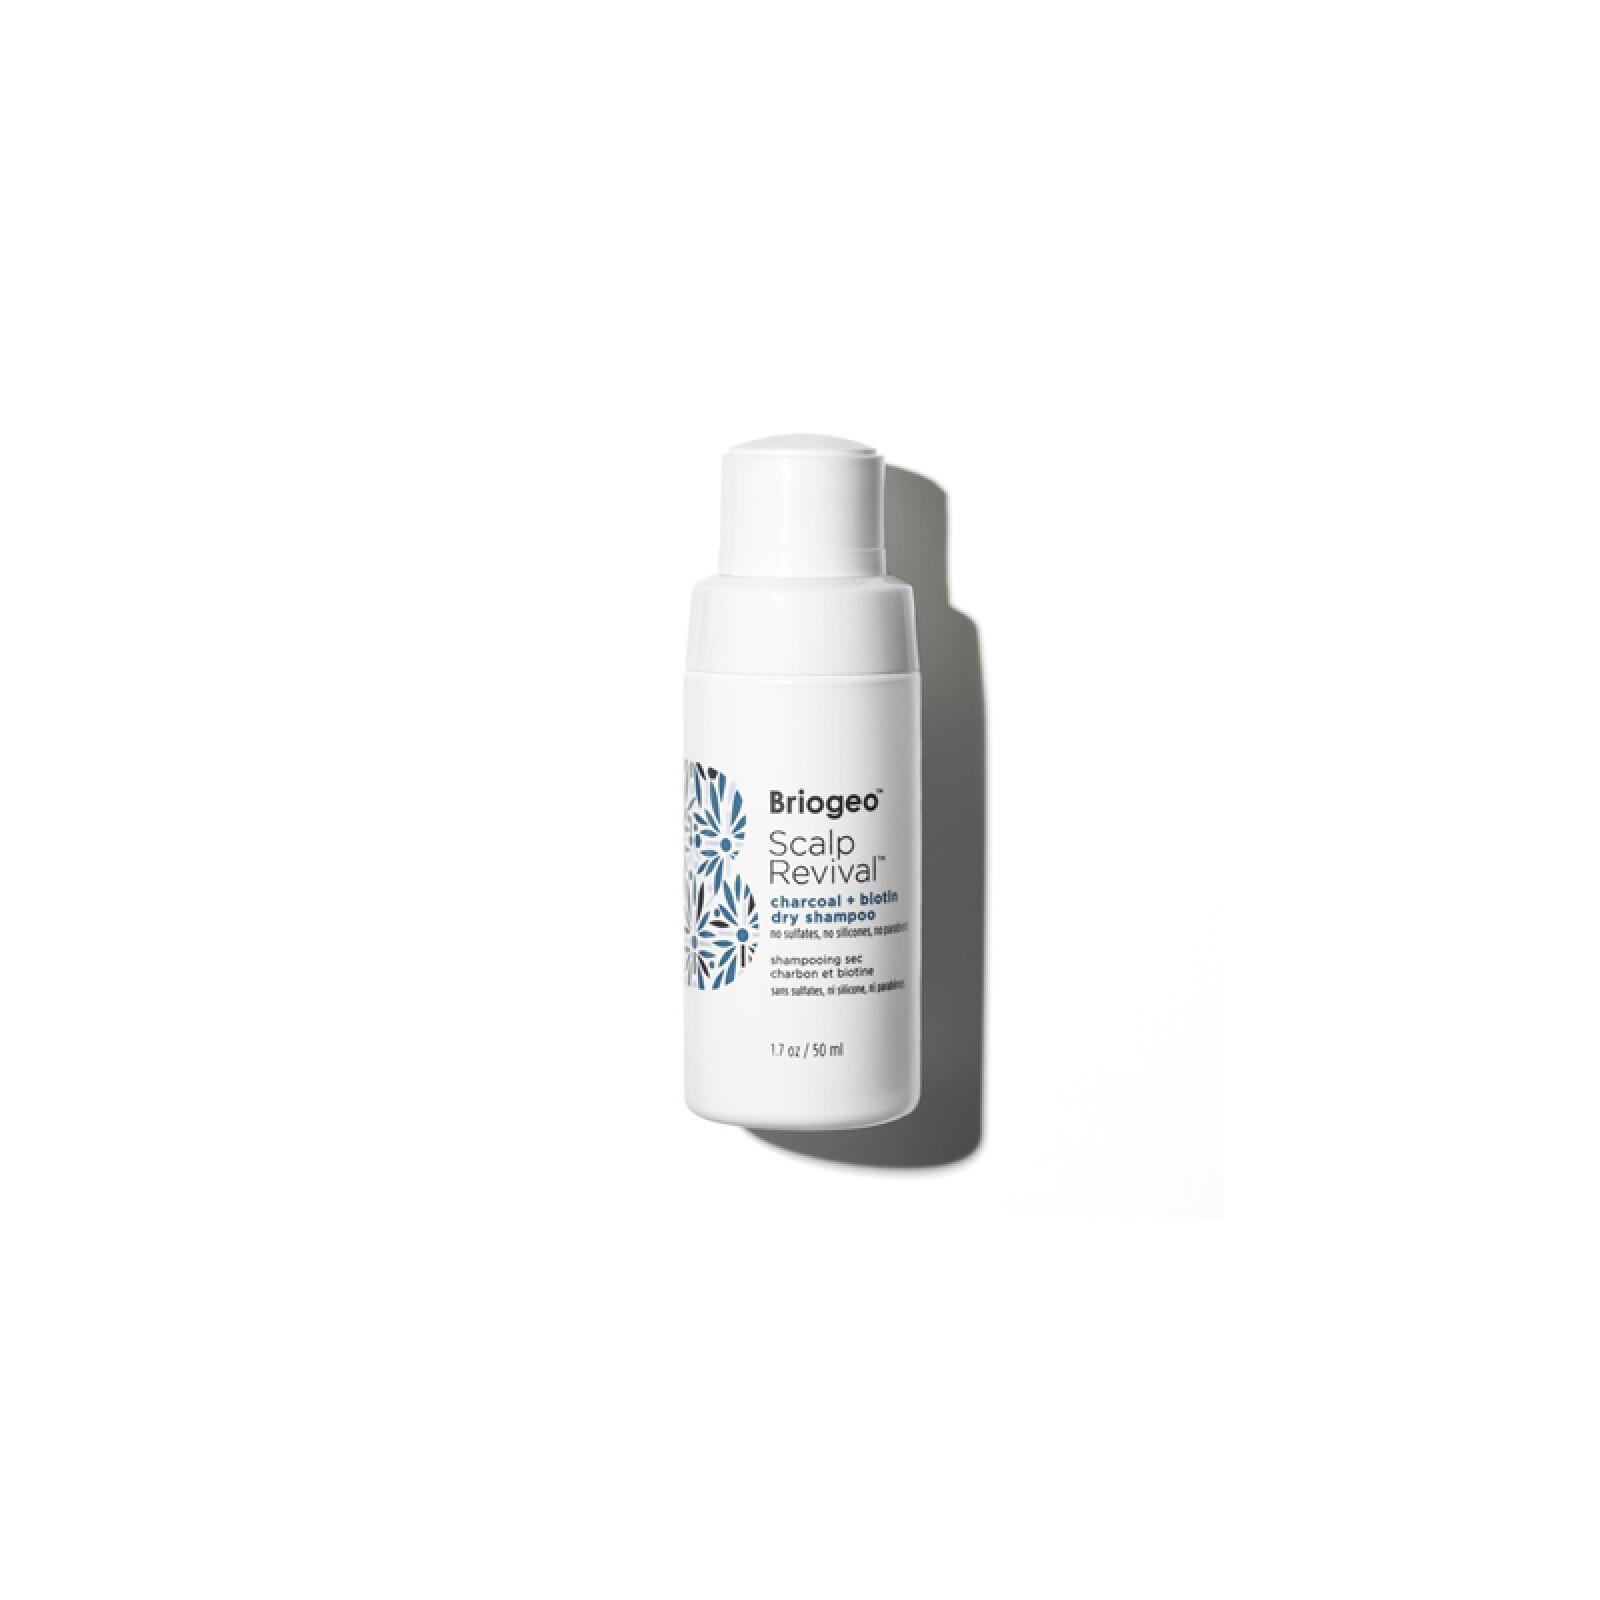 Briogeo Scalp Revival Charcoal + Biotin Dry Shampoo ($640, sephora.com.mx)